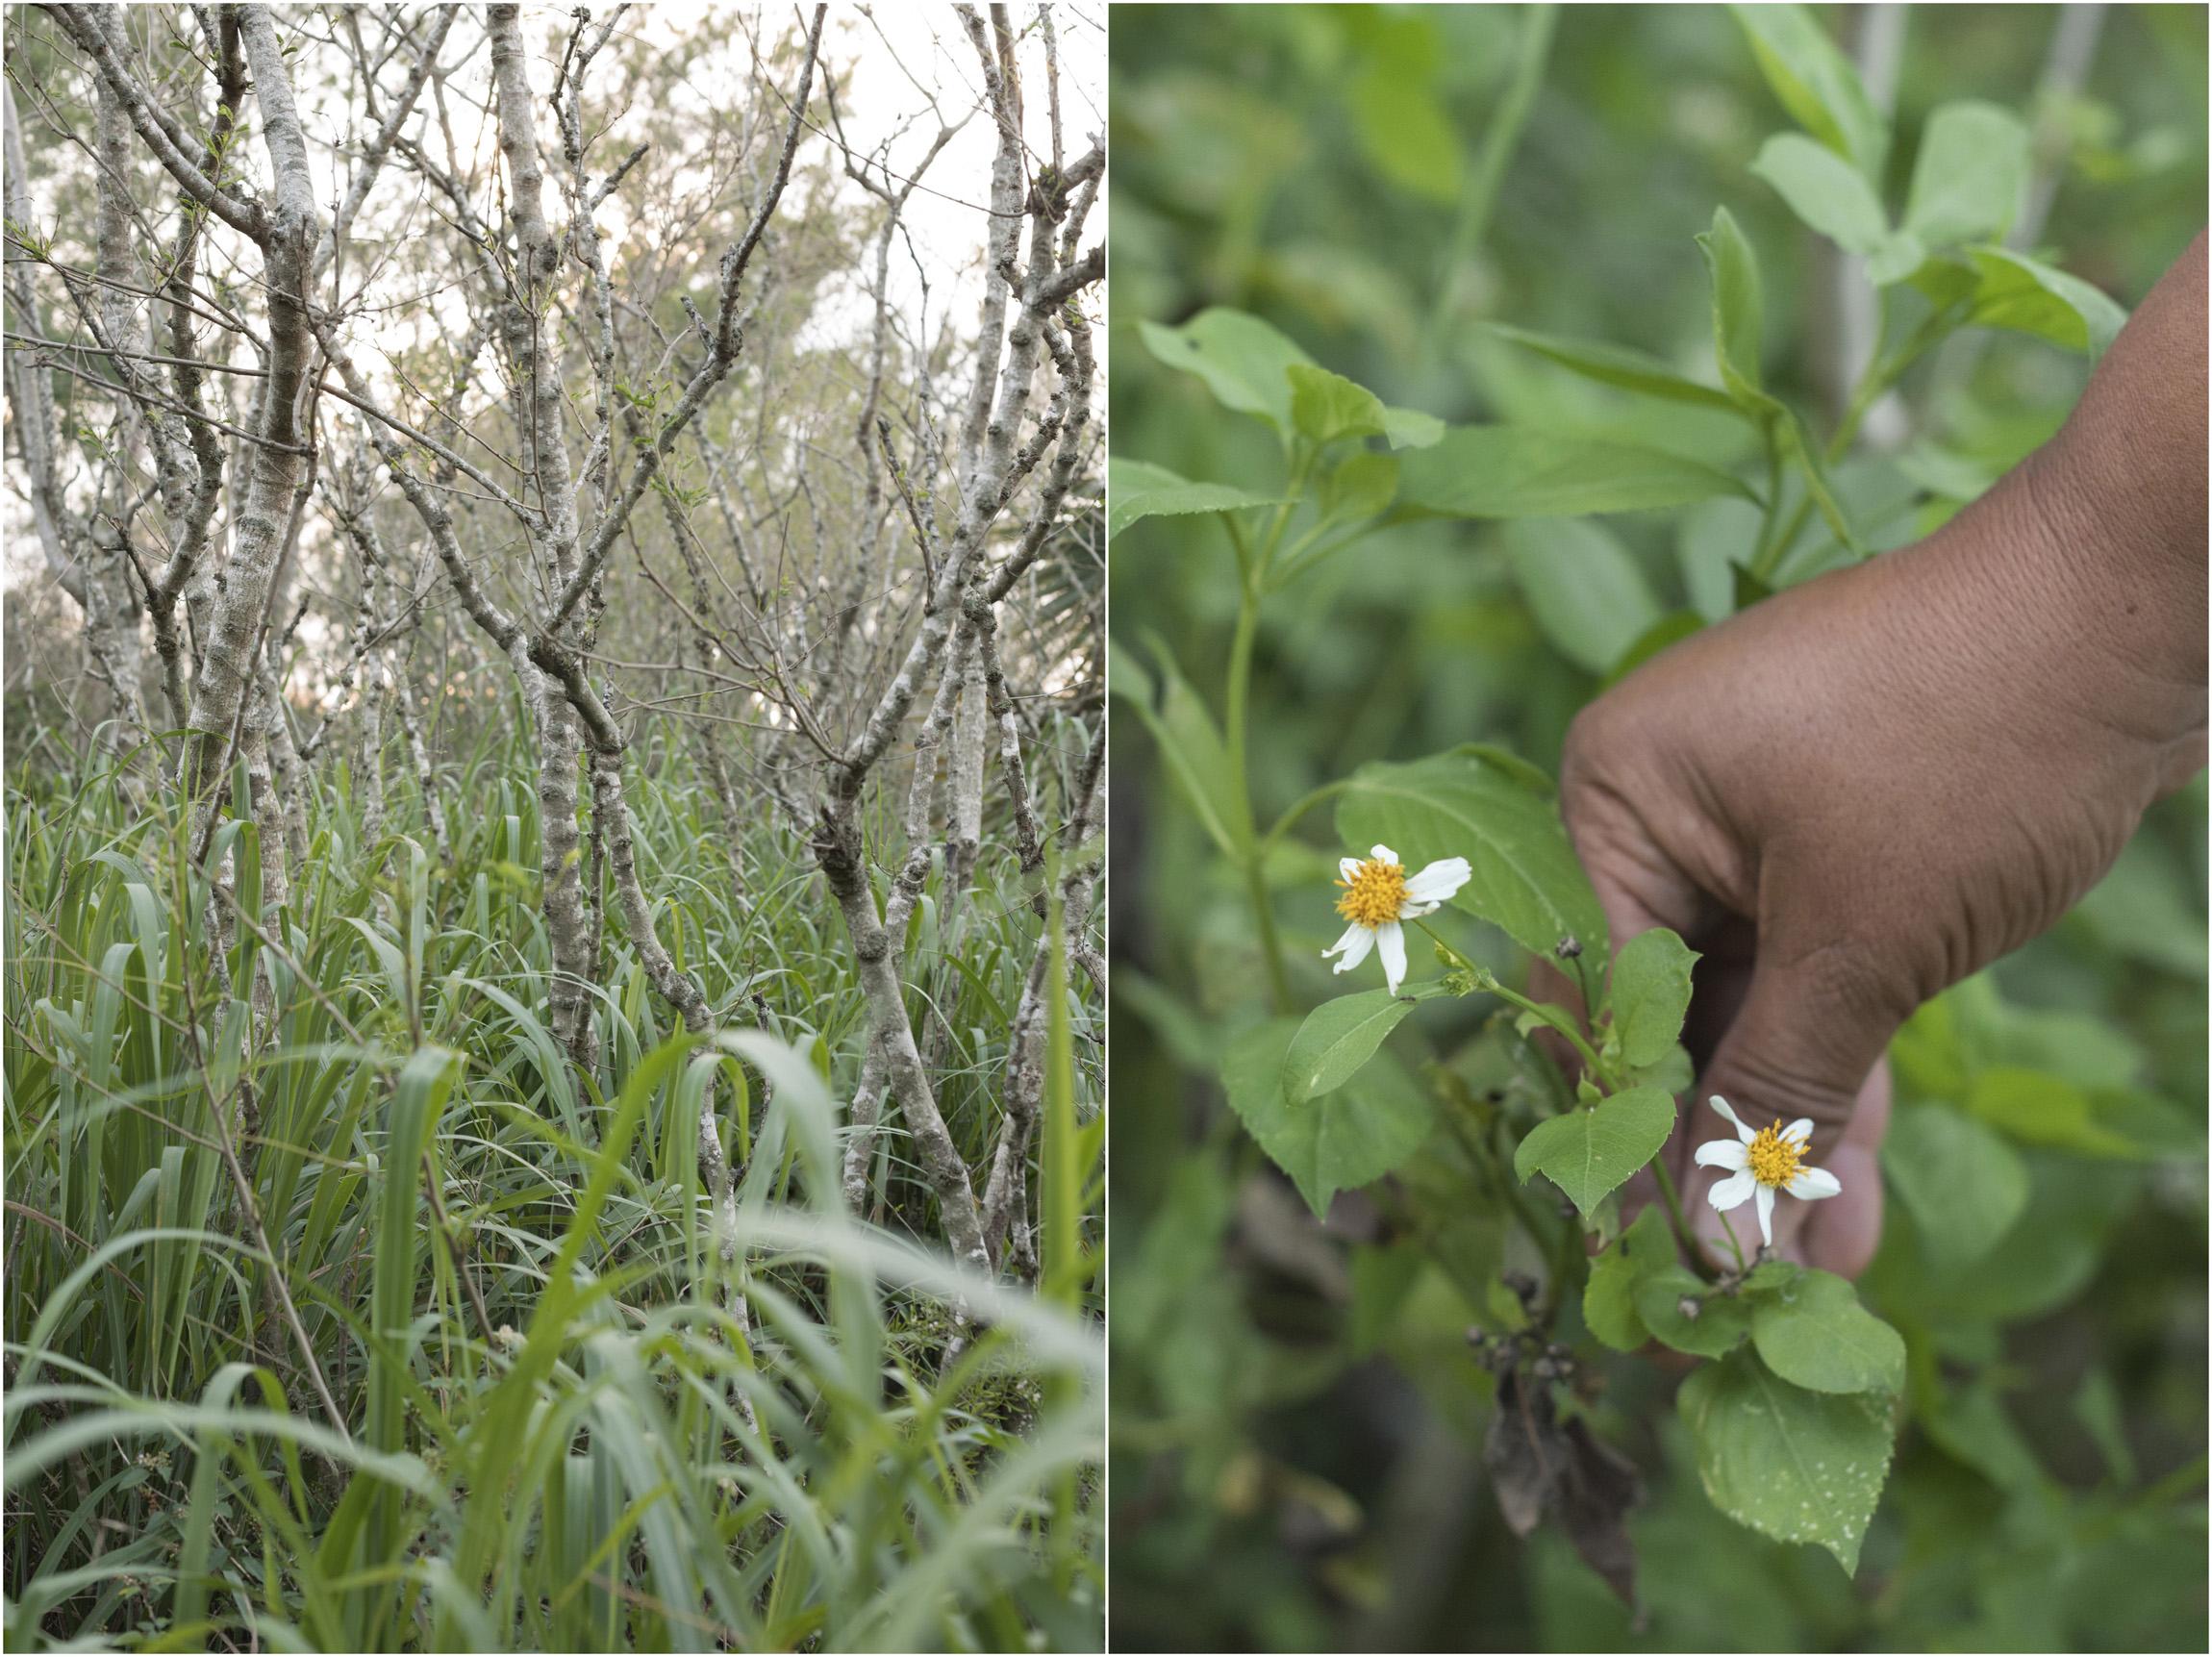 ©FianderFoto_Winnow_Five Senses Wild Edible Herbal Tour_004.jpg